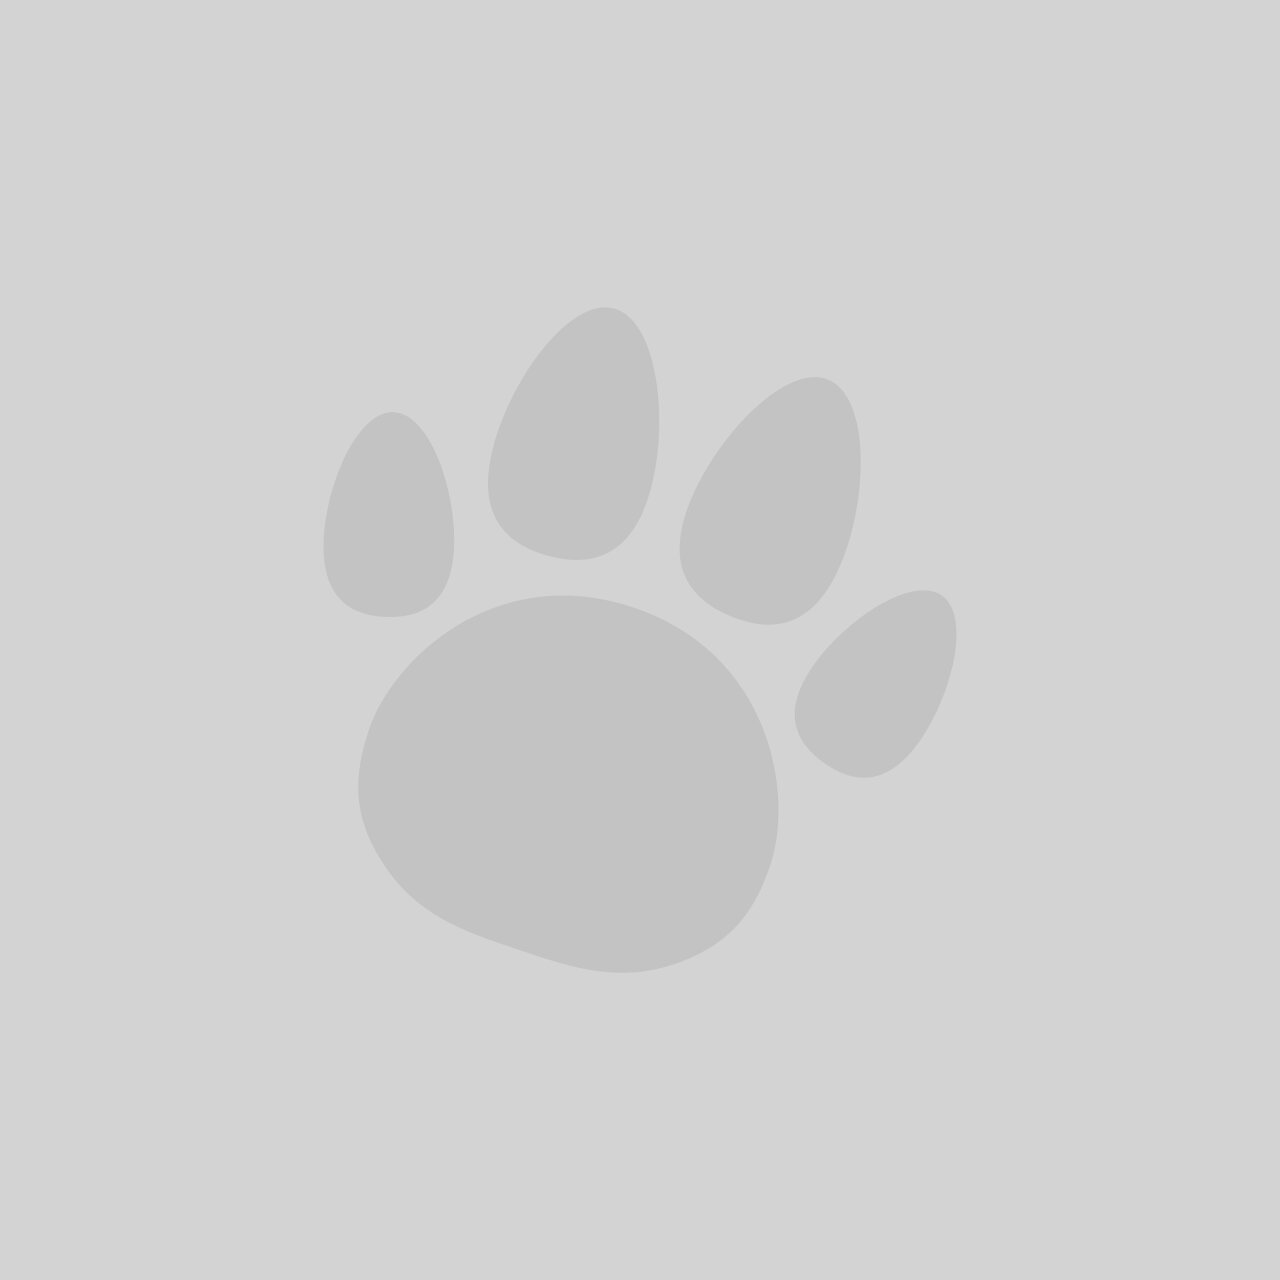 Eukanuba Puppy & Junior Dry Dog Food Large Chicken 3kg